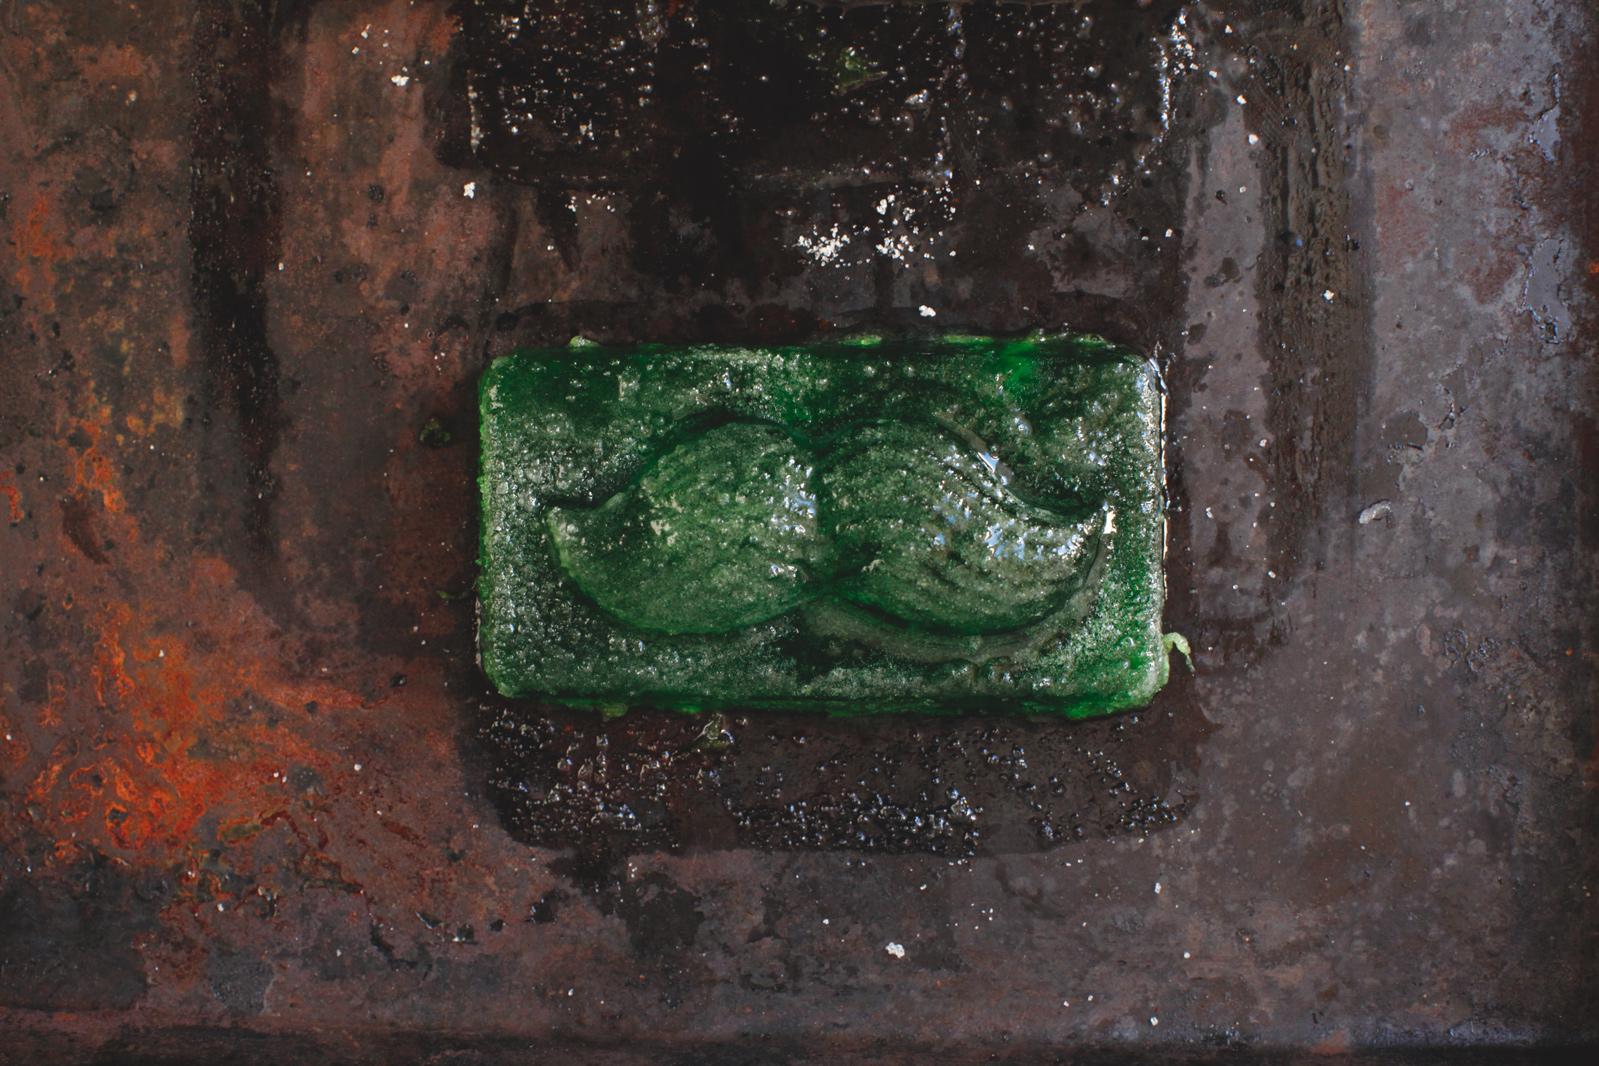 pici-e-castagne-gelatine-2